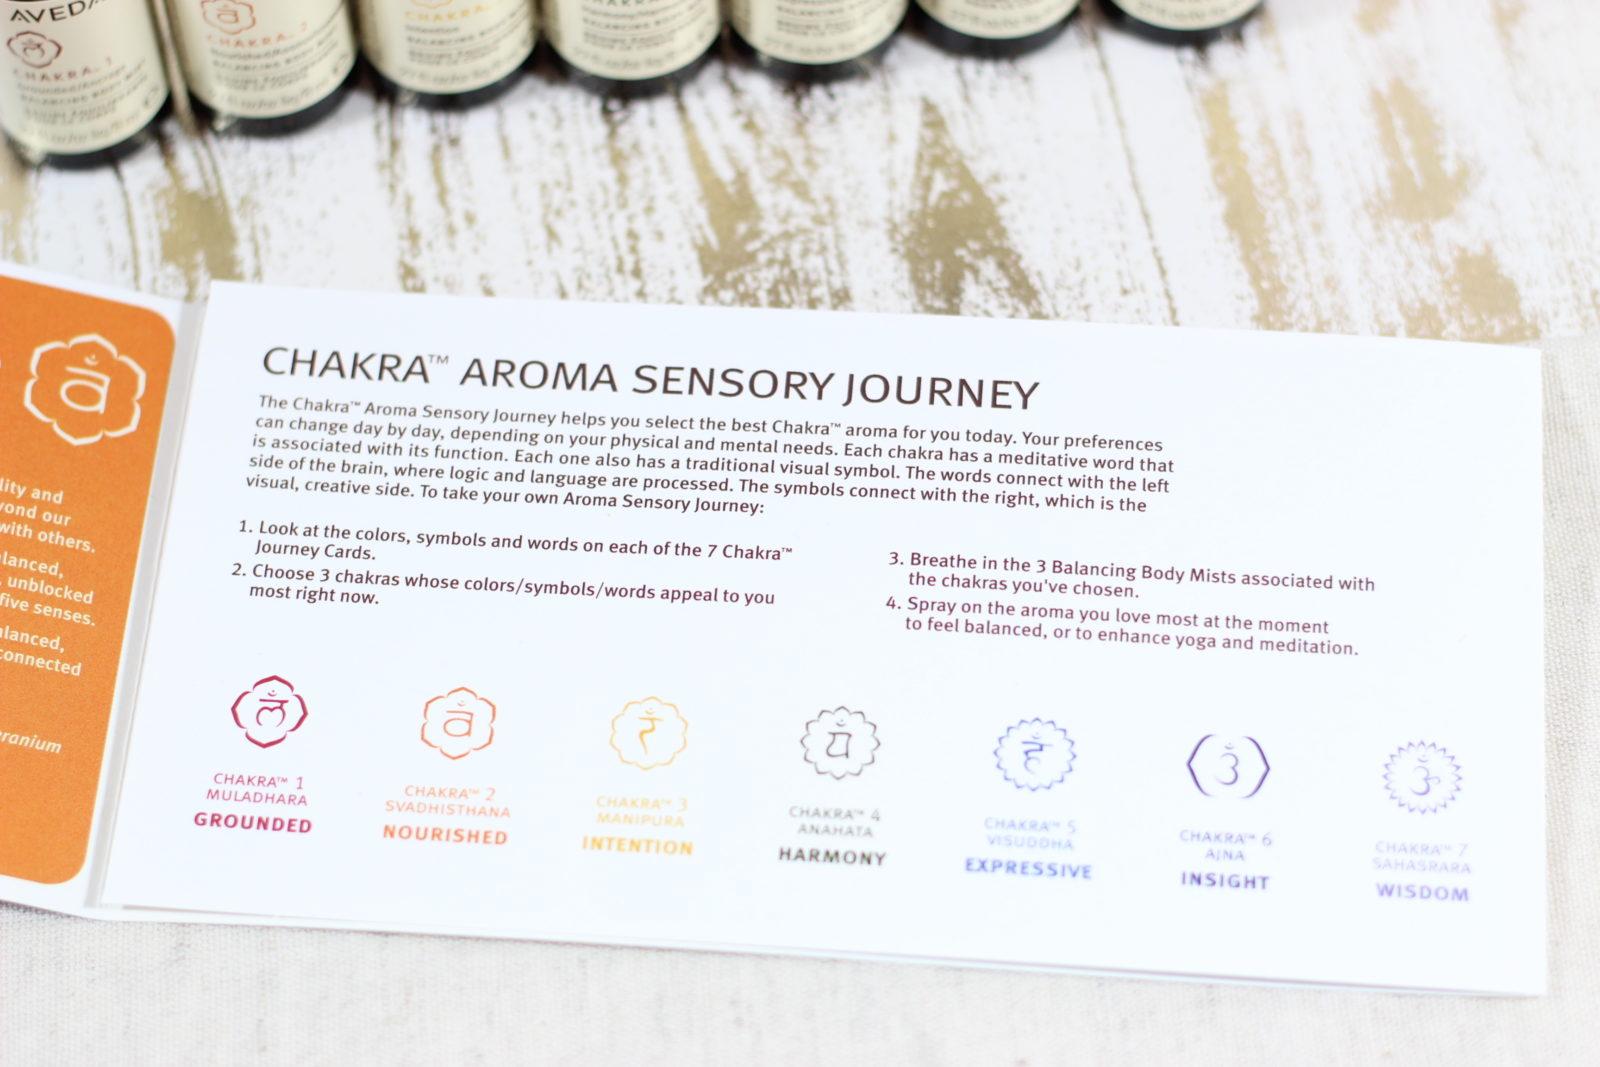 Chakra Aroma Sensory Journey